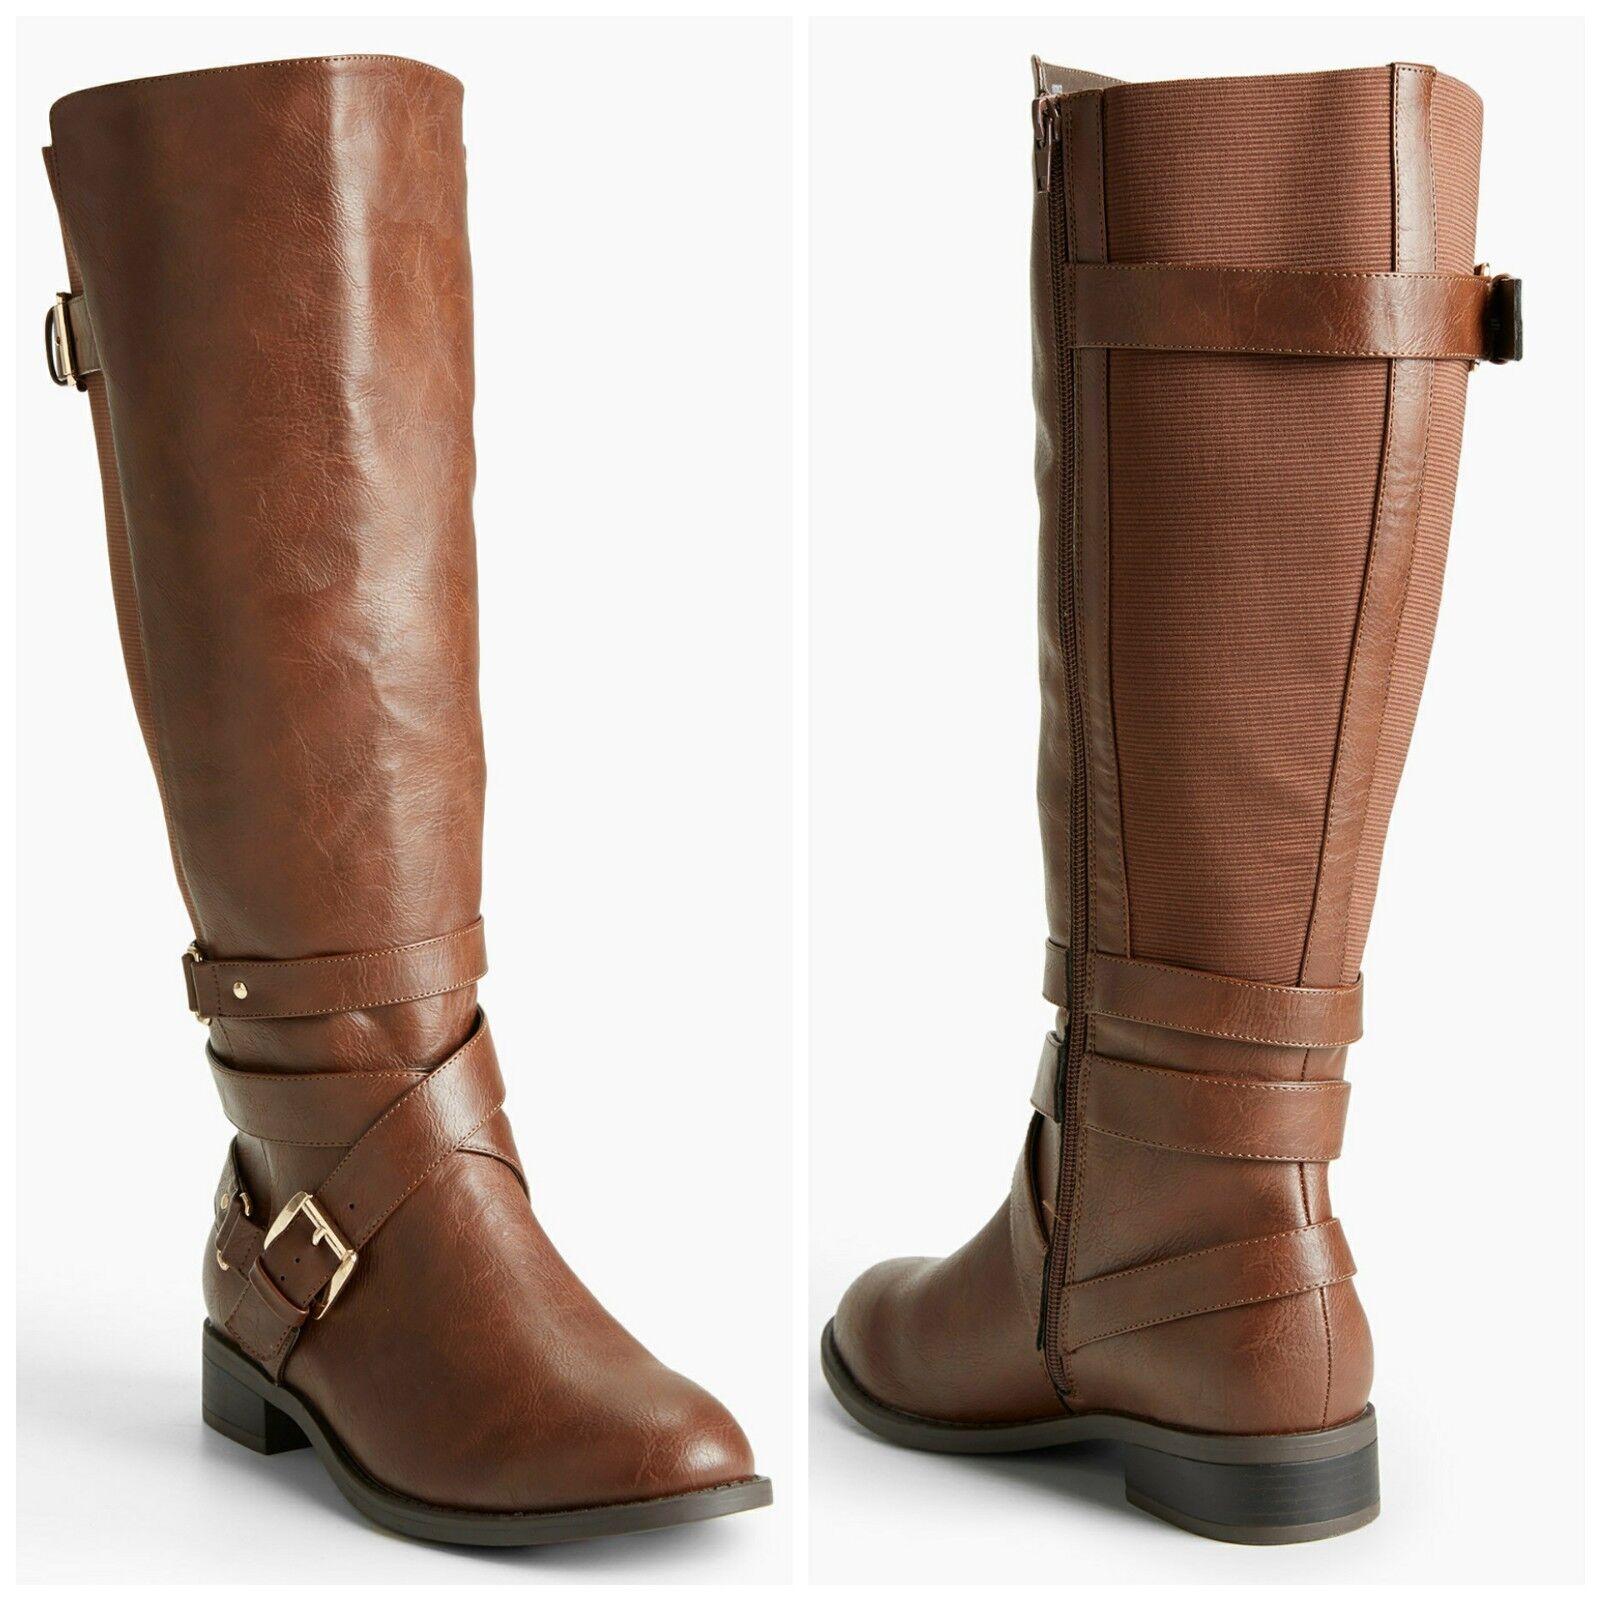 TORRID NIB Size 6.5W Brown Multi Buckle Strap Gore Tall Boots (Wide Width)